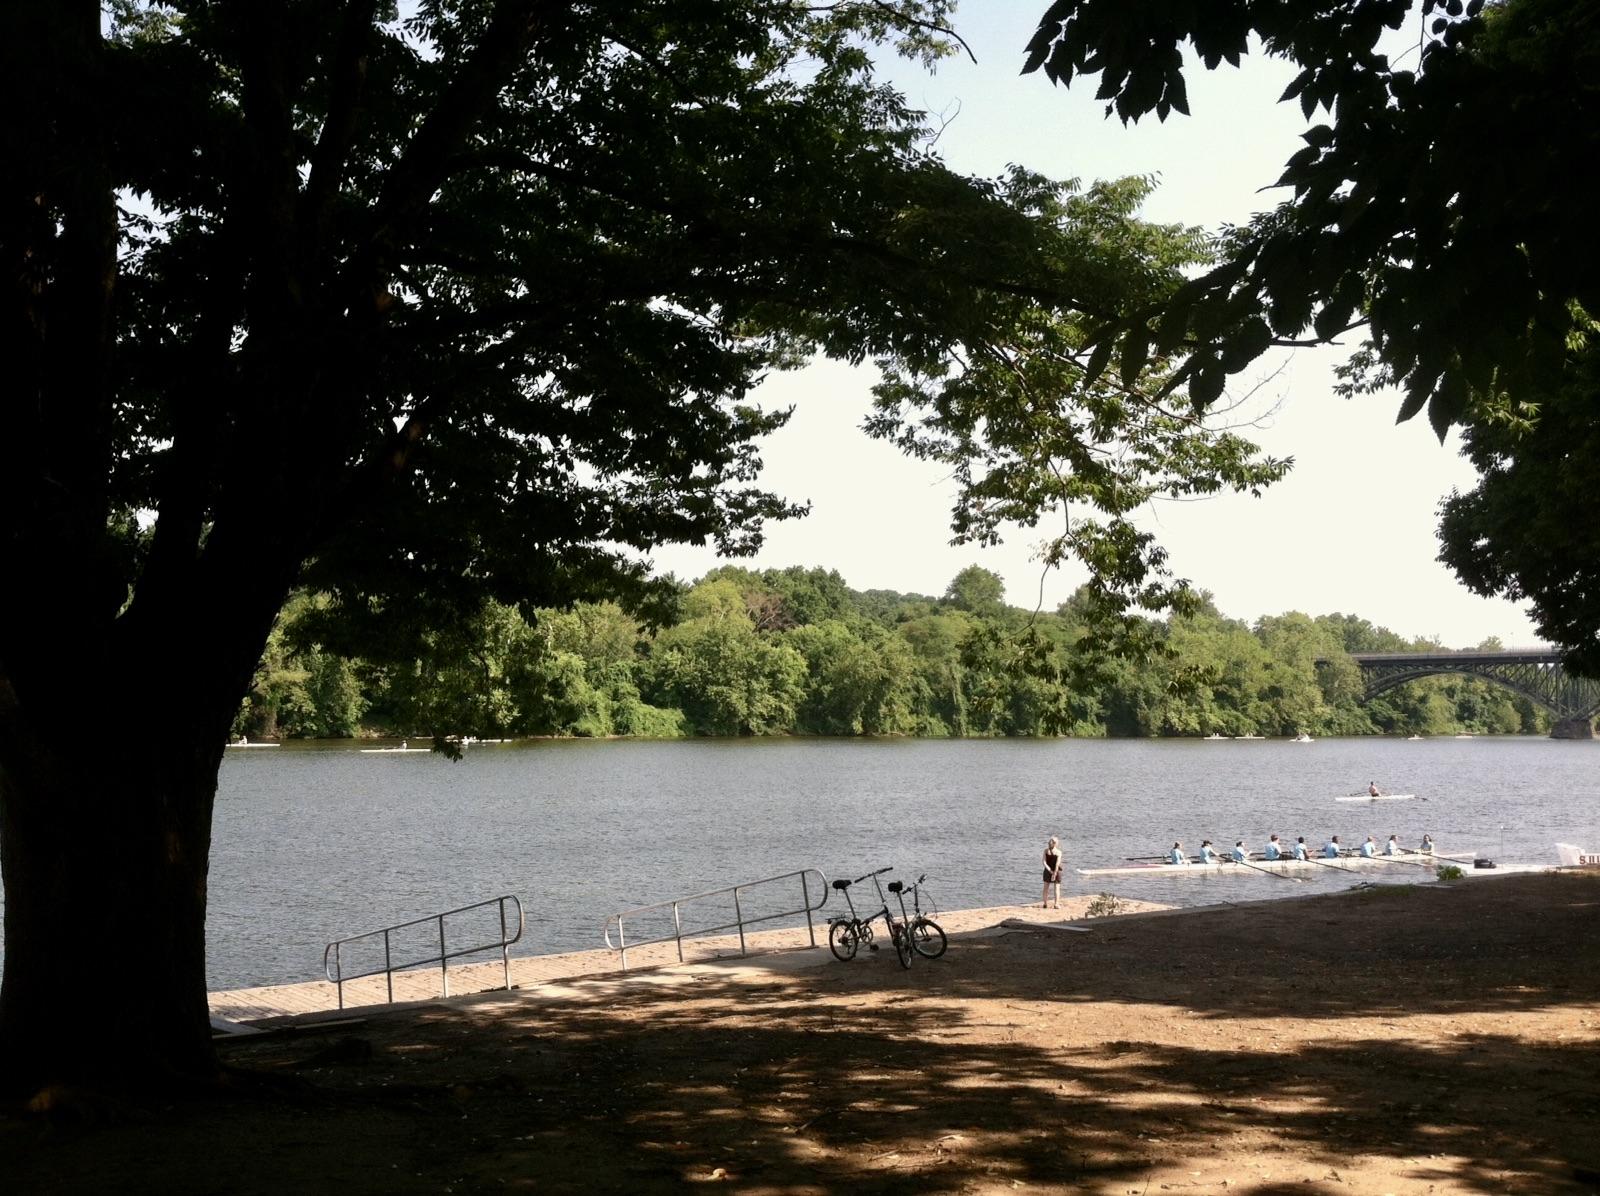 Schuylkill River in East Falls, Philadelphia